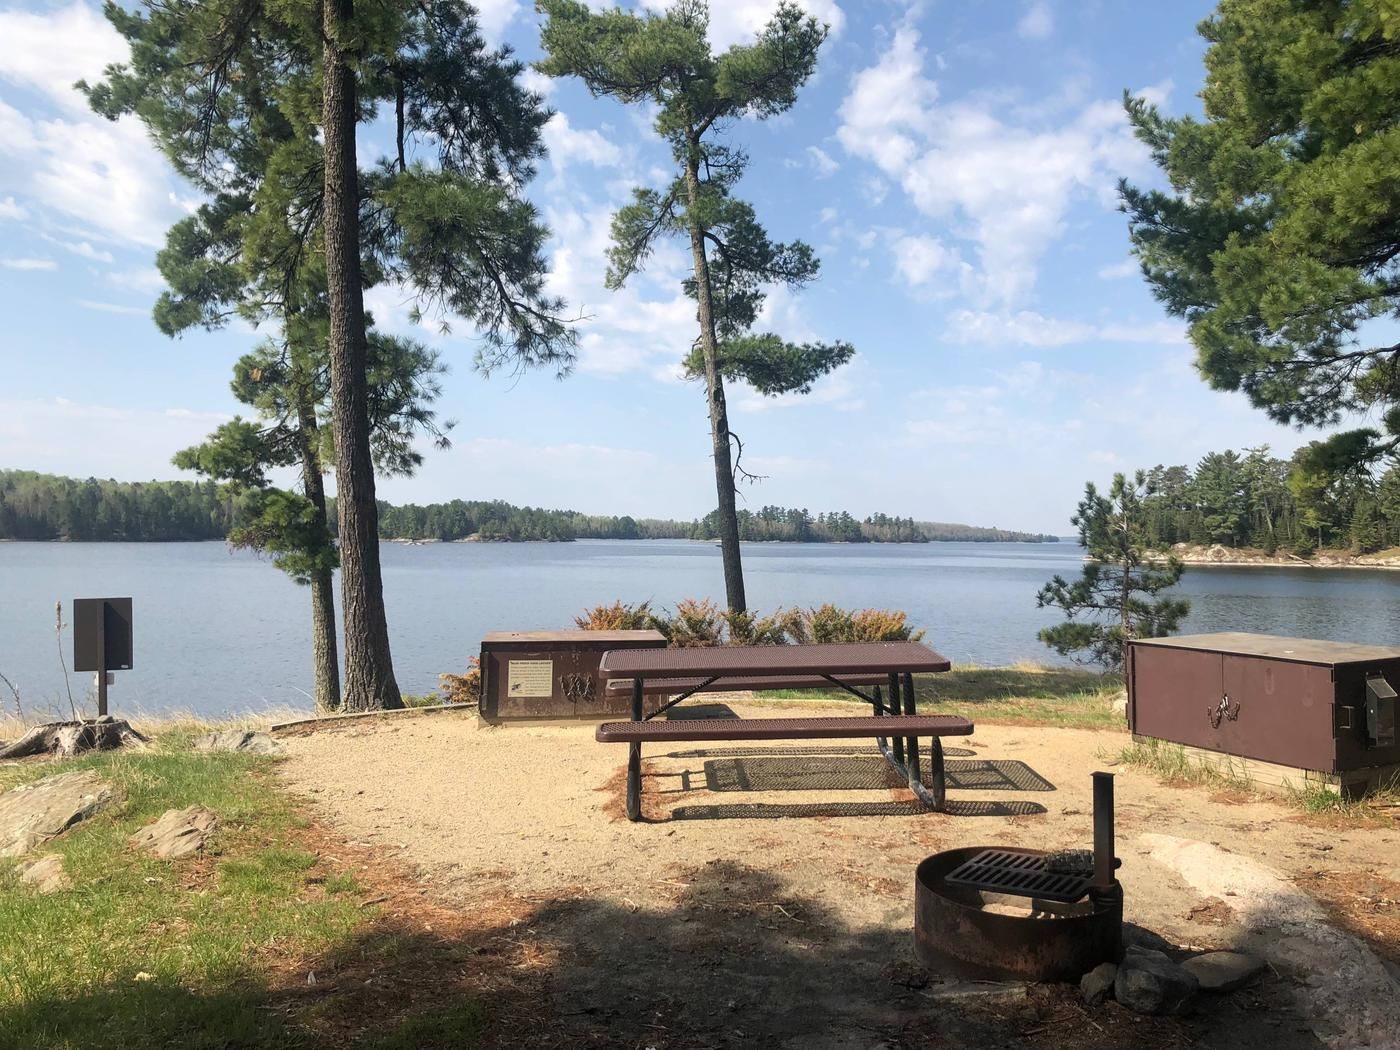 K17 - Lost Bay IslandK17 - Lost Bay Island campsite on Kabetogama Lake